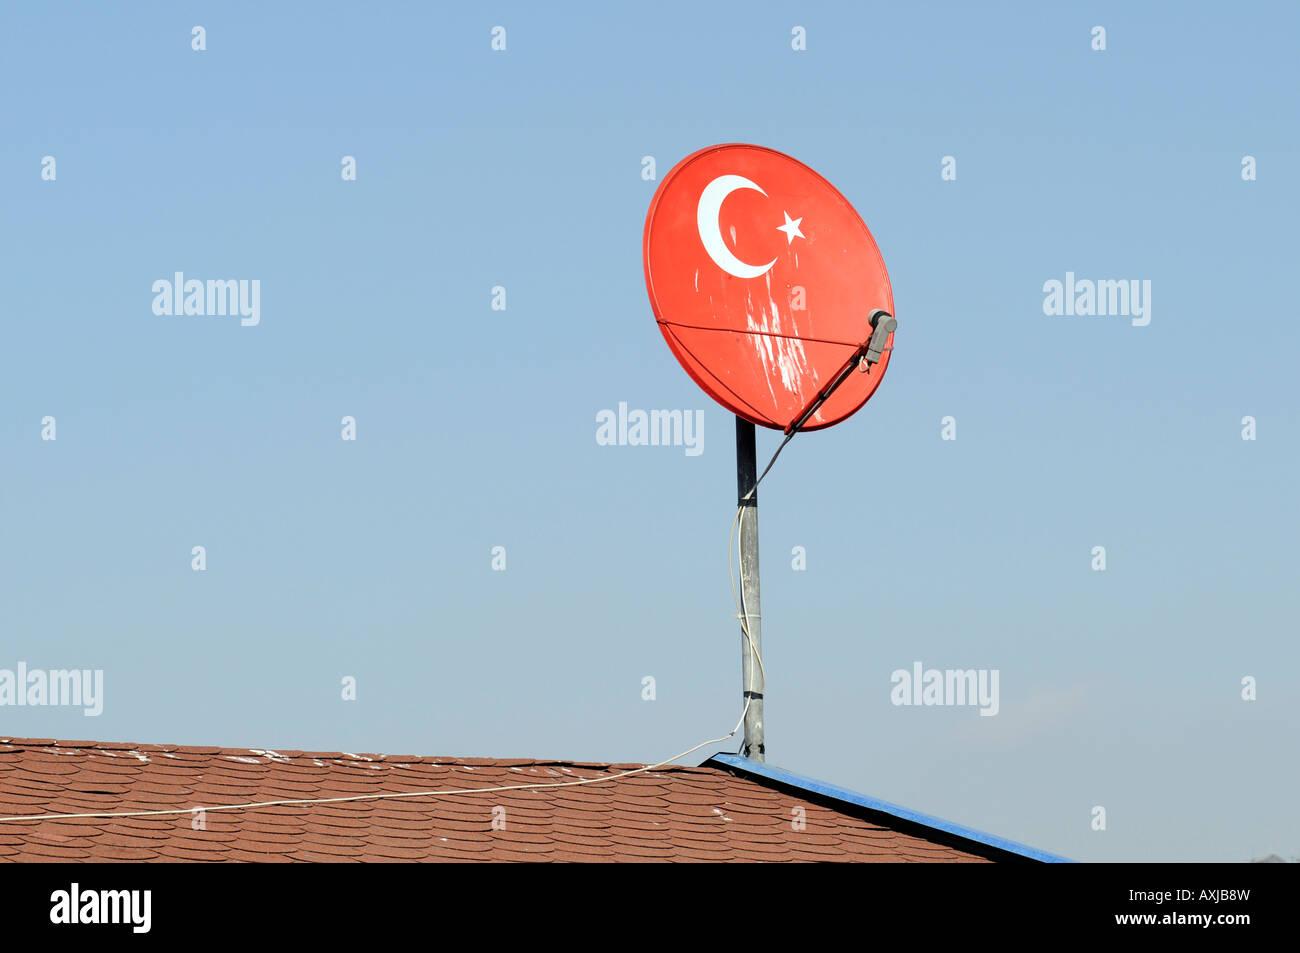 Satellite TV dish with the Turkish flag. Photo taken in Istanbul, Turkey. - Stock Image